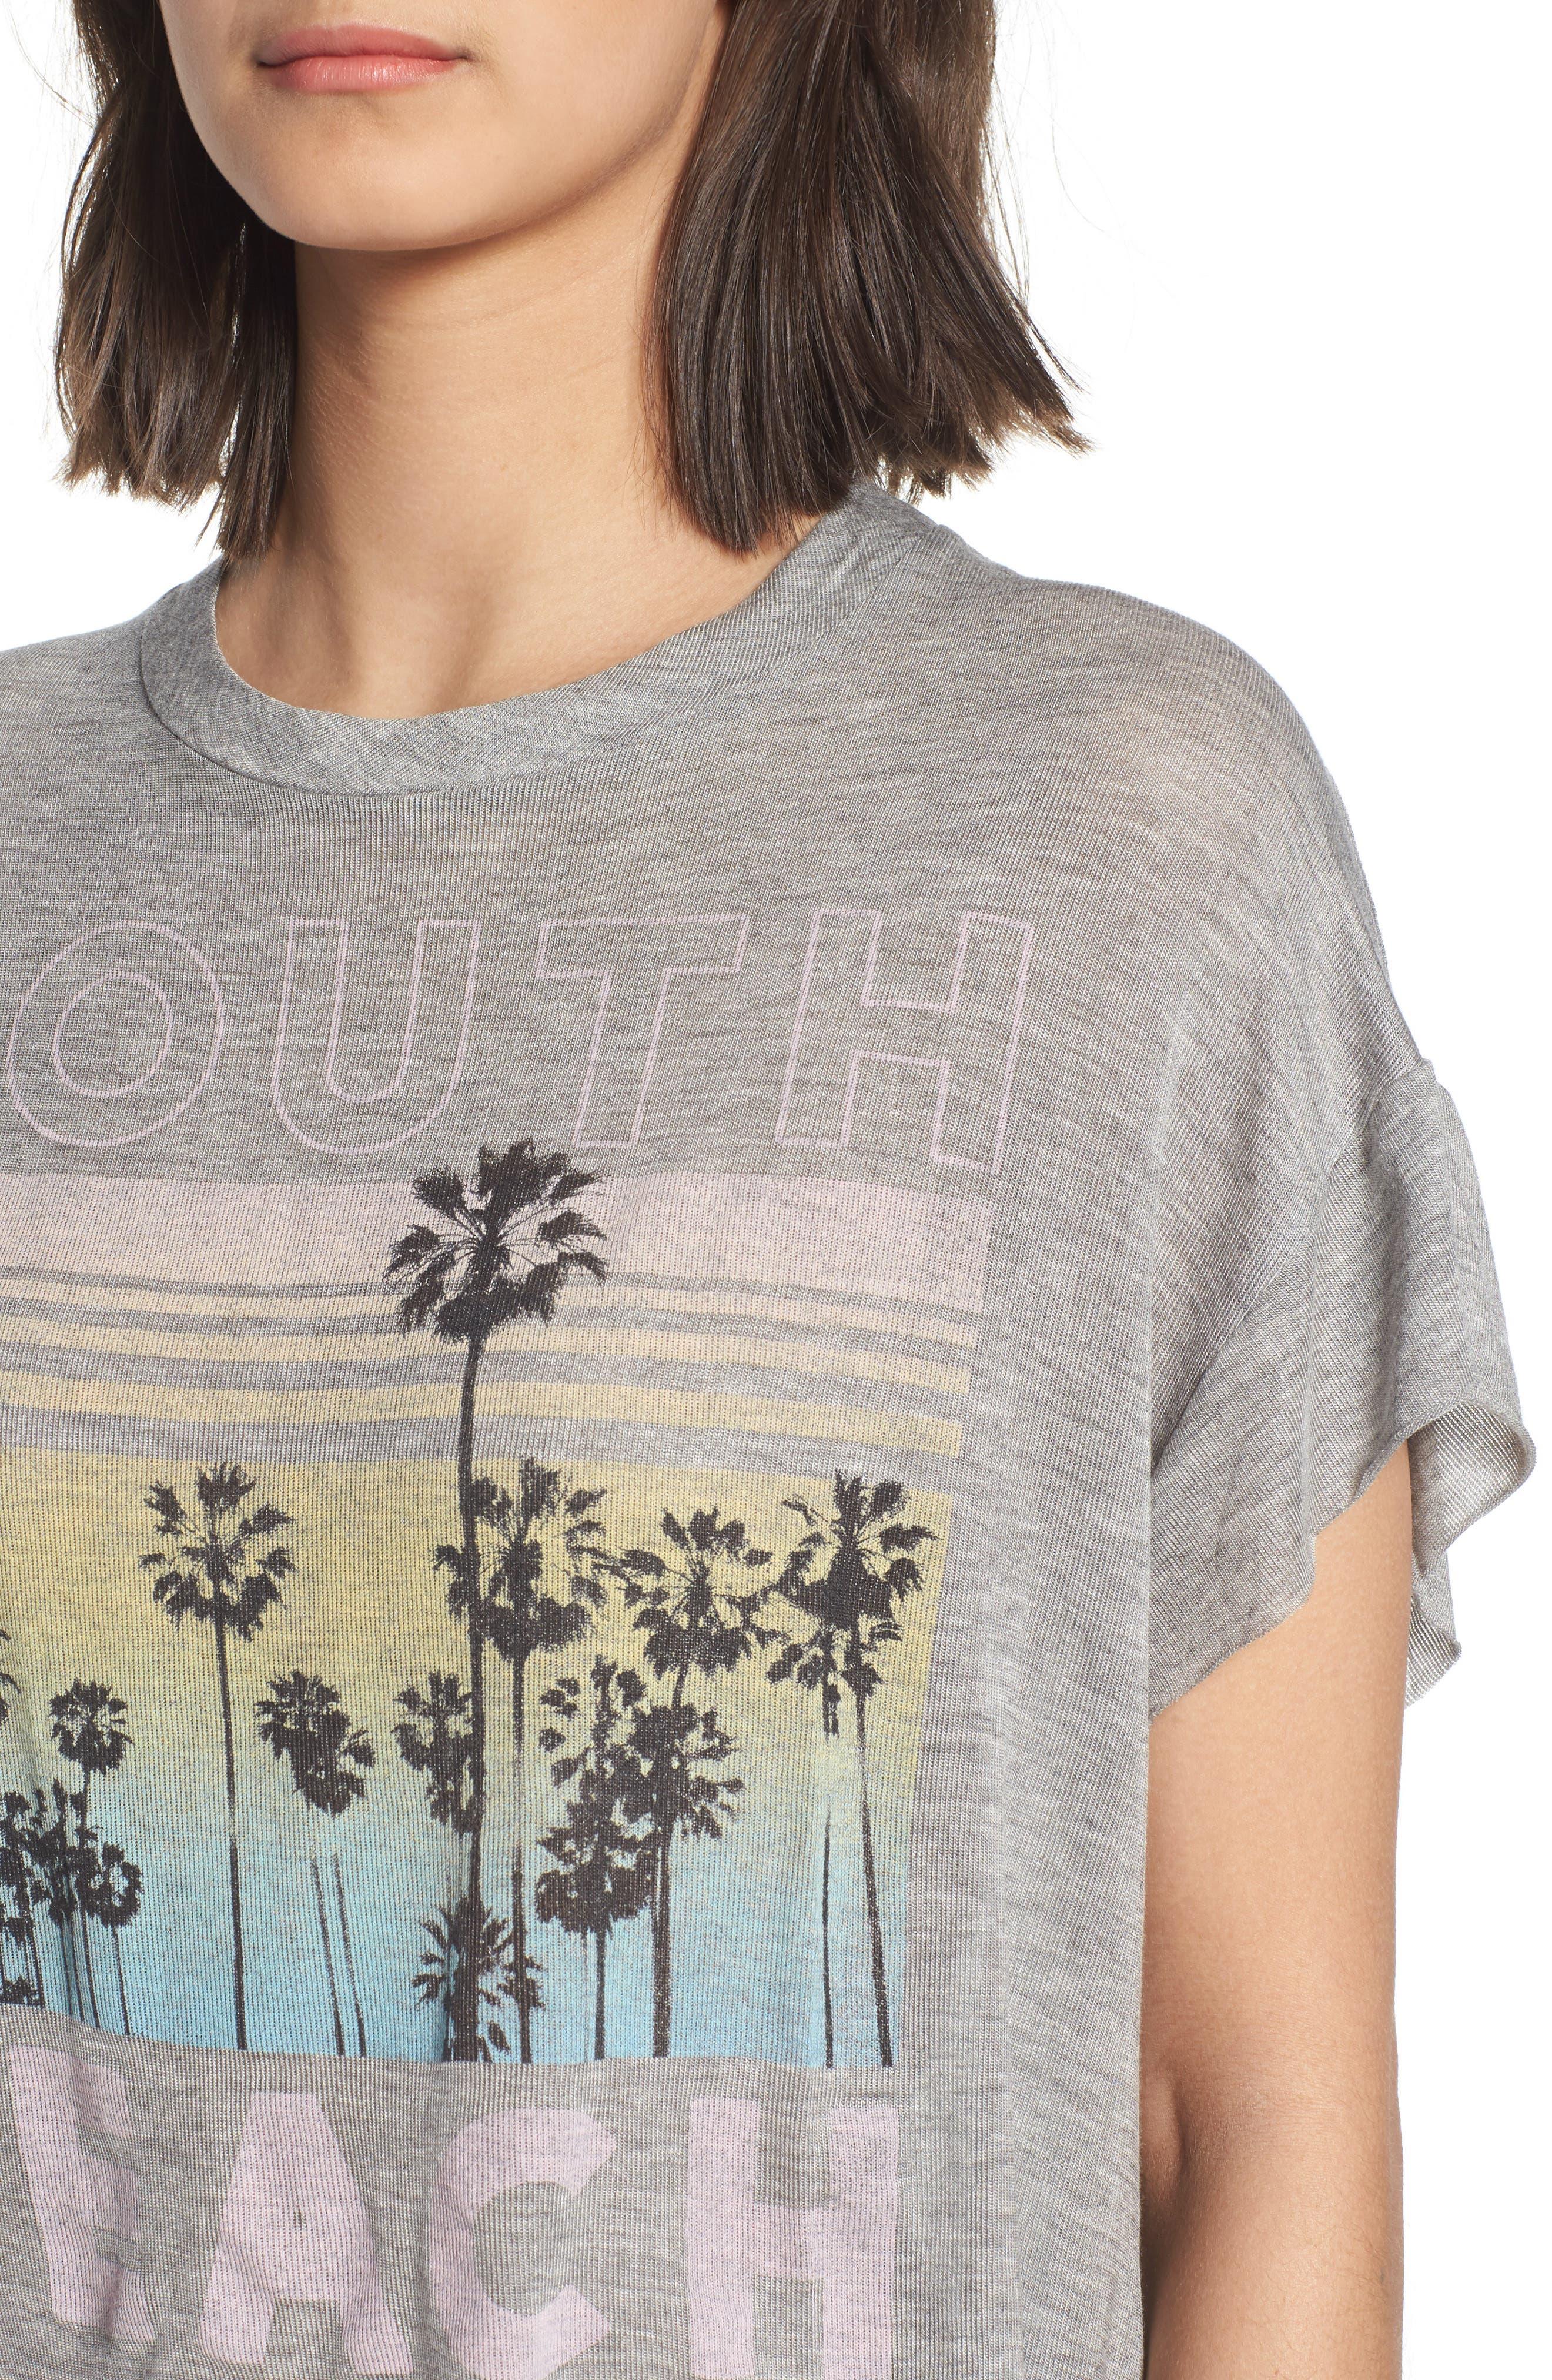 South Beach Boxy Crop Tee,                             Alternate thumbnail 4, color,                             Heather Grey